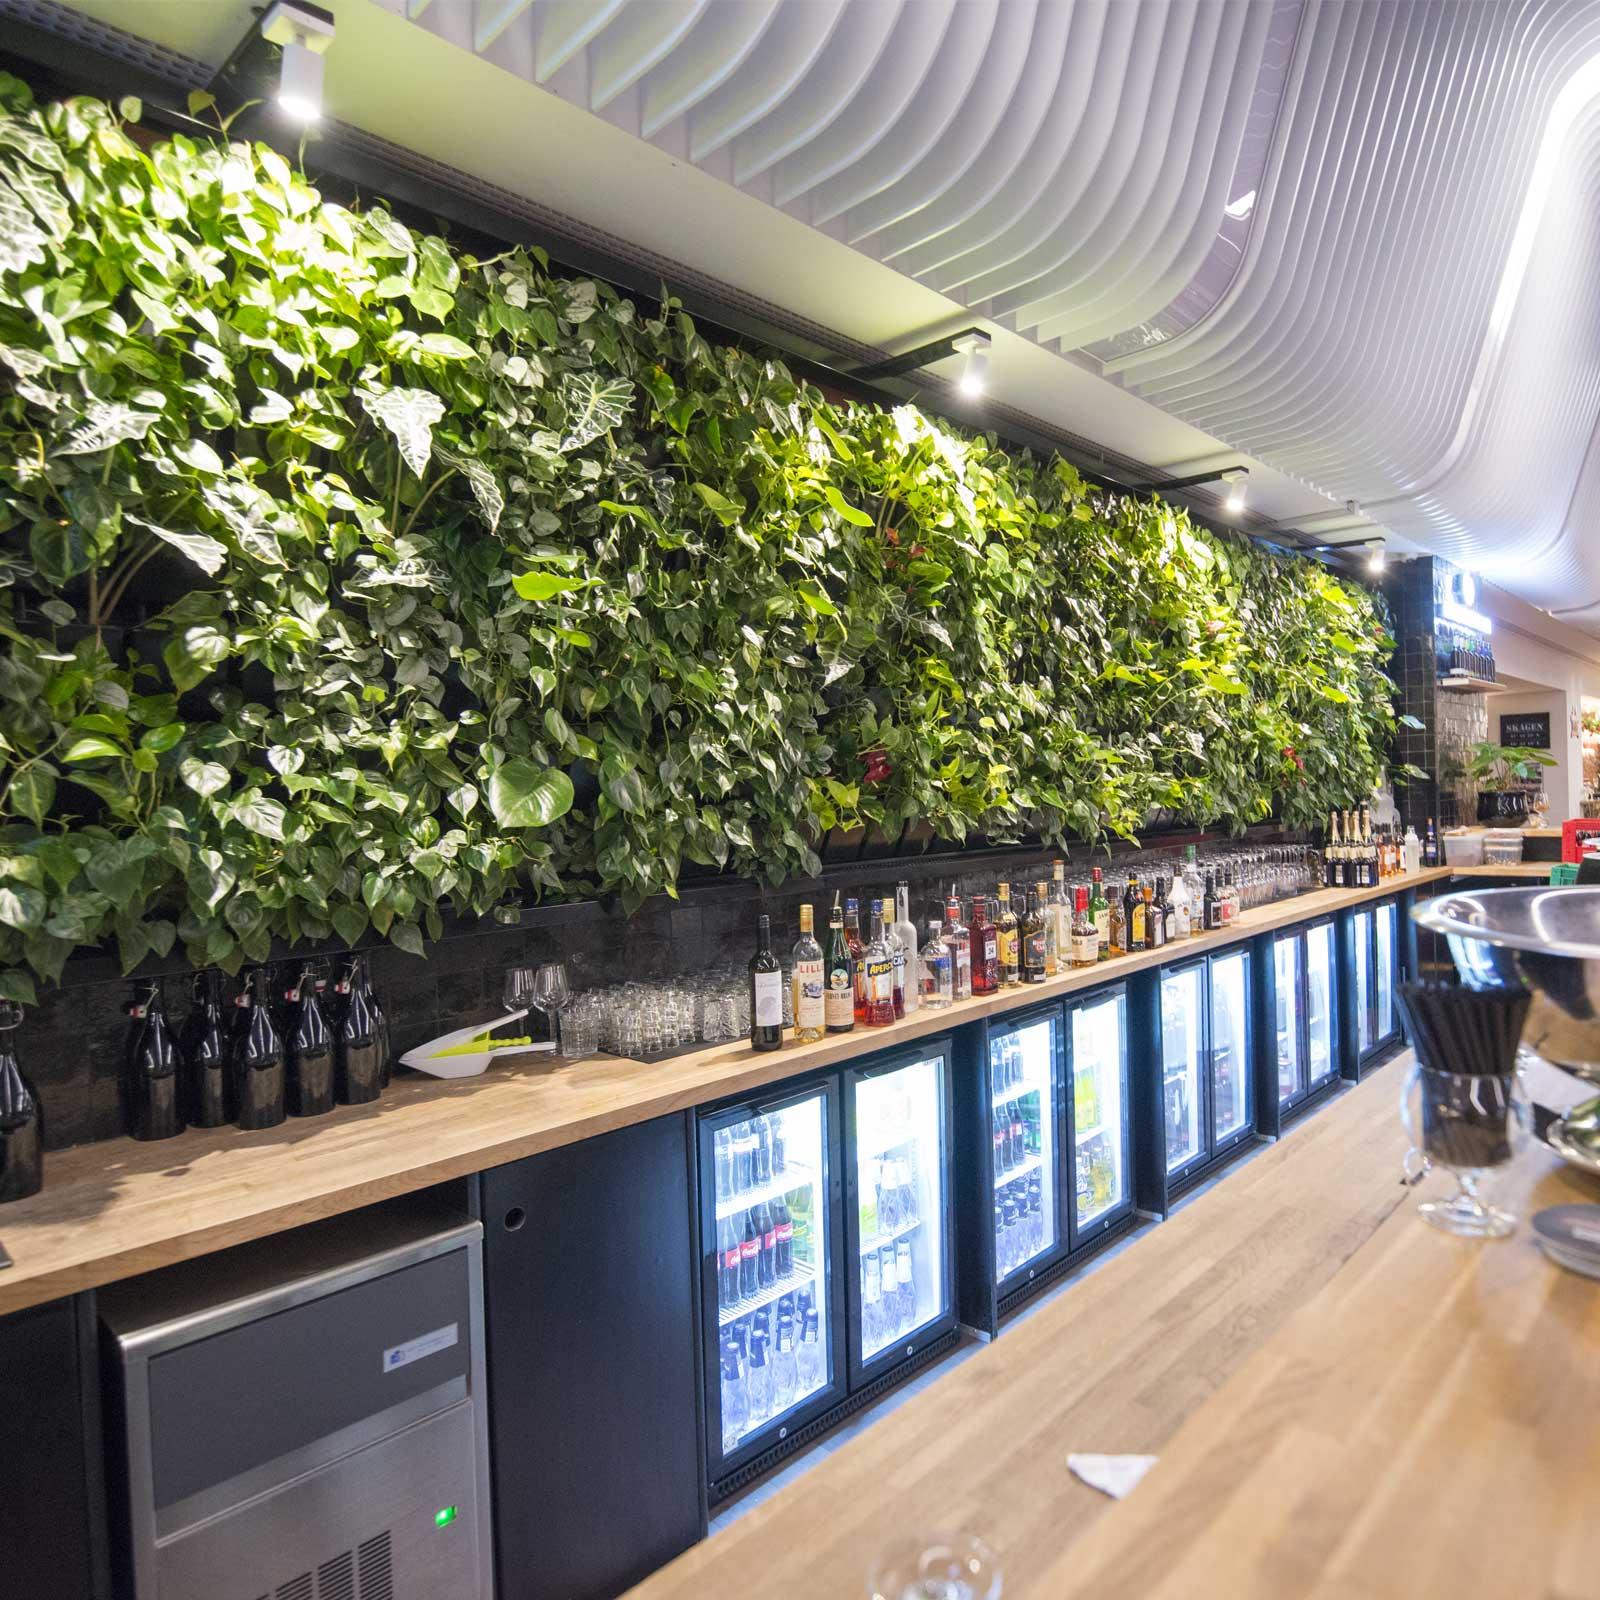 Plantevæg i bar, plantevægge, plantevæg pris